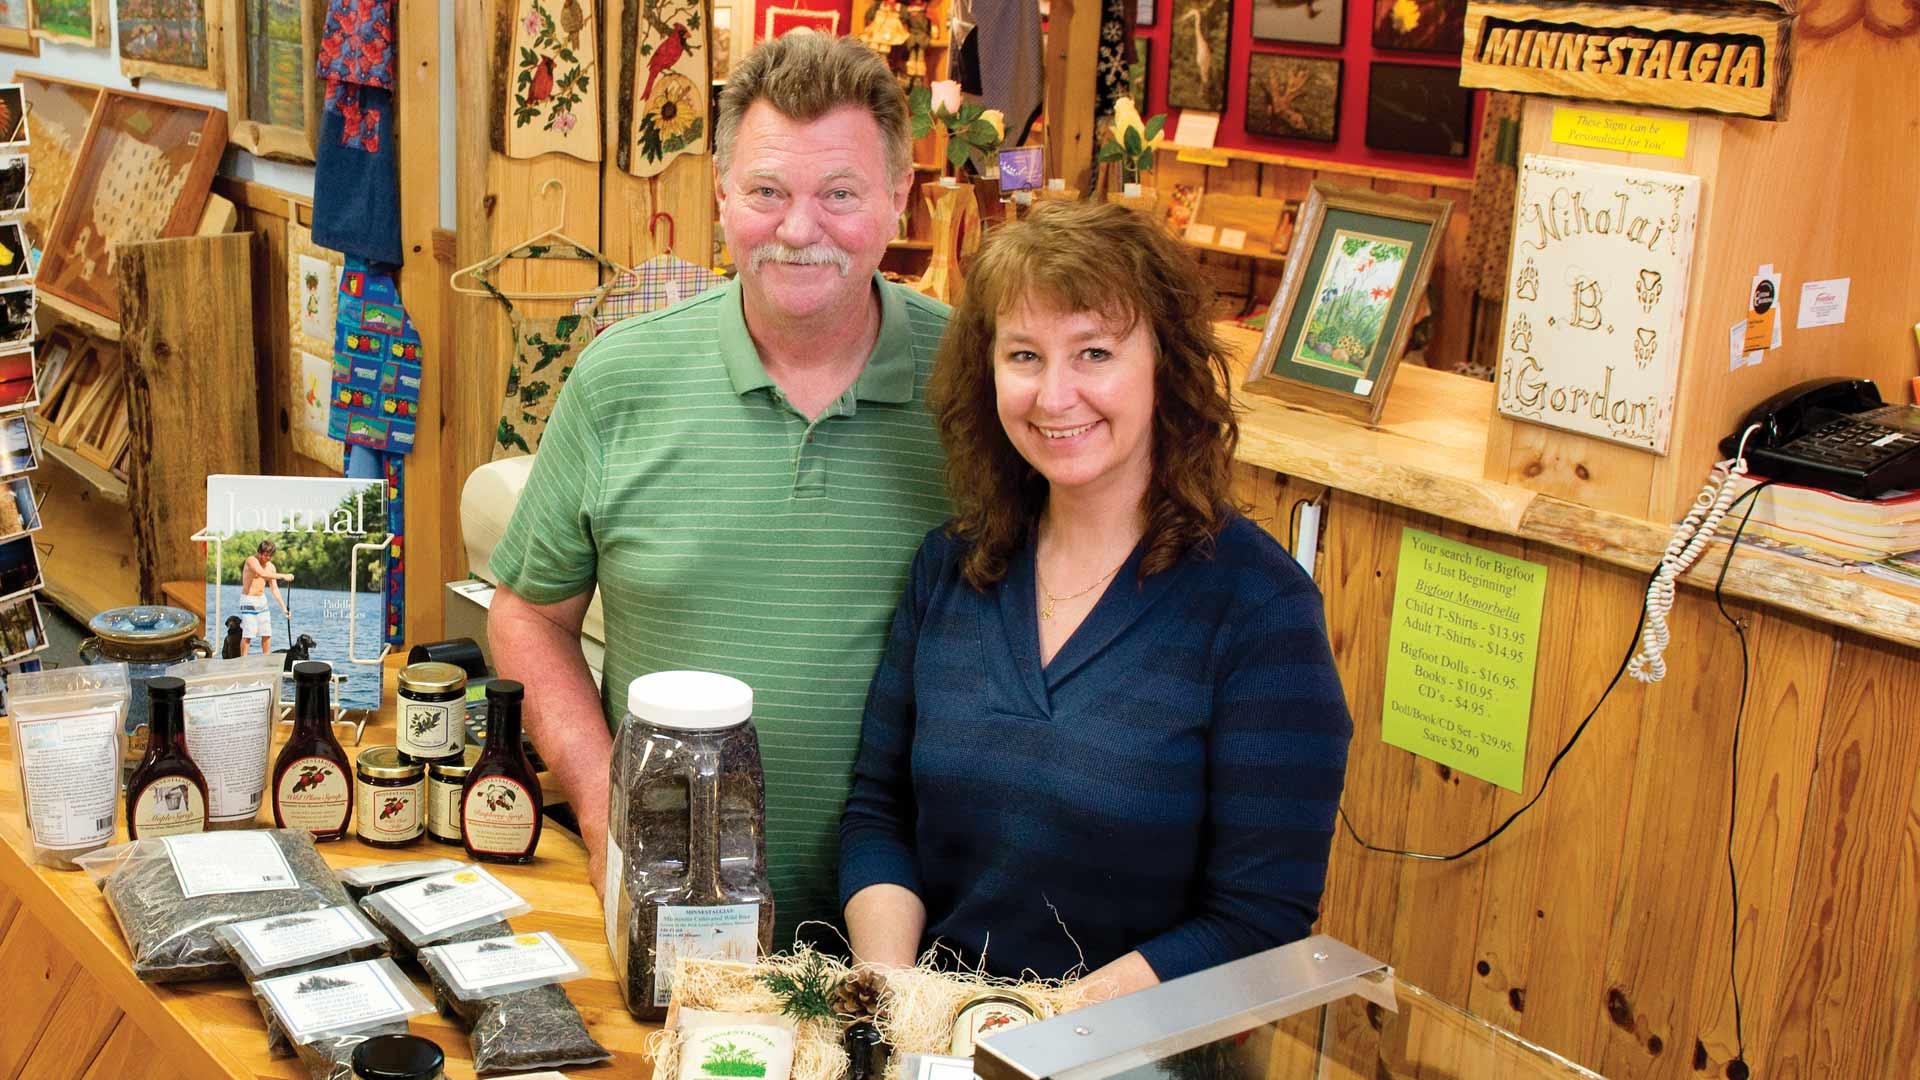 two people in Minnesota Minnestalgia gift shop